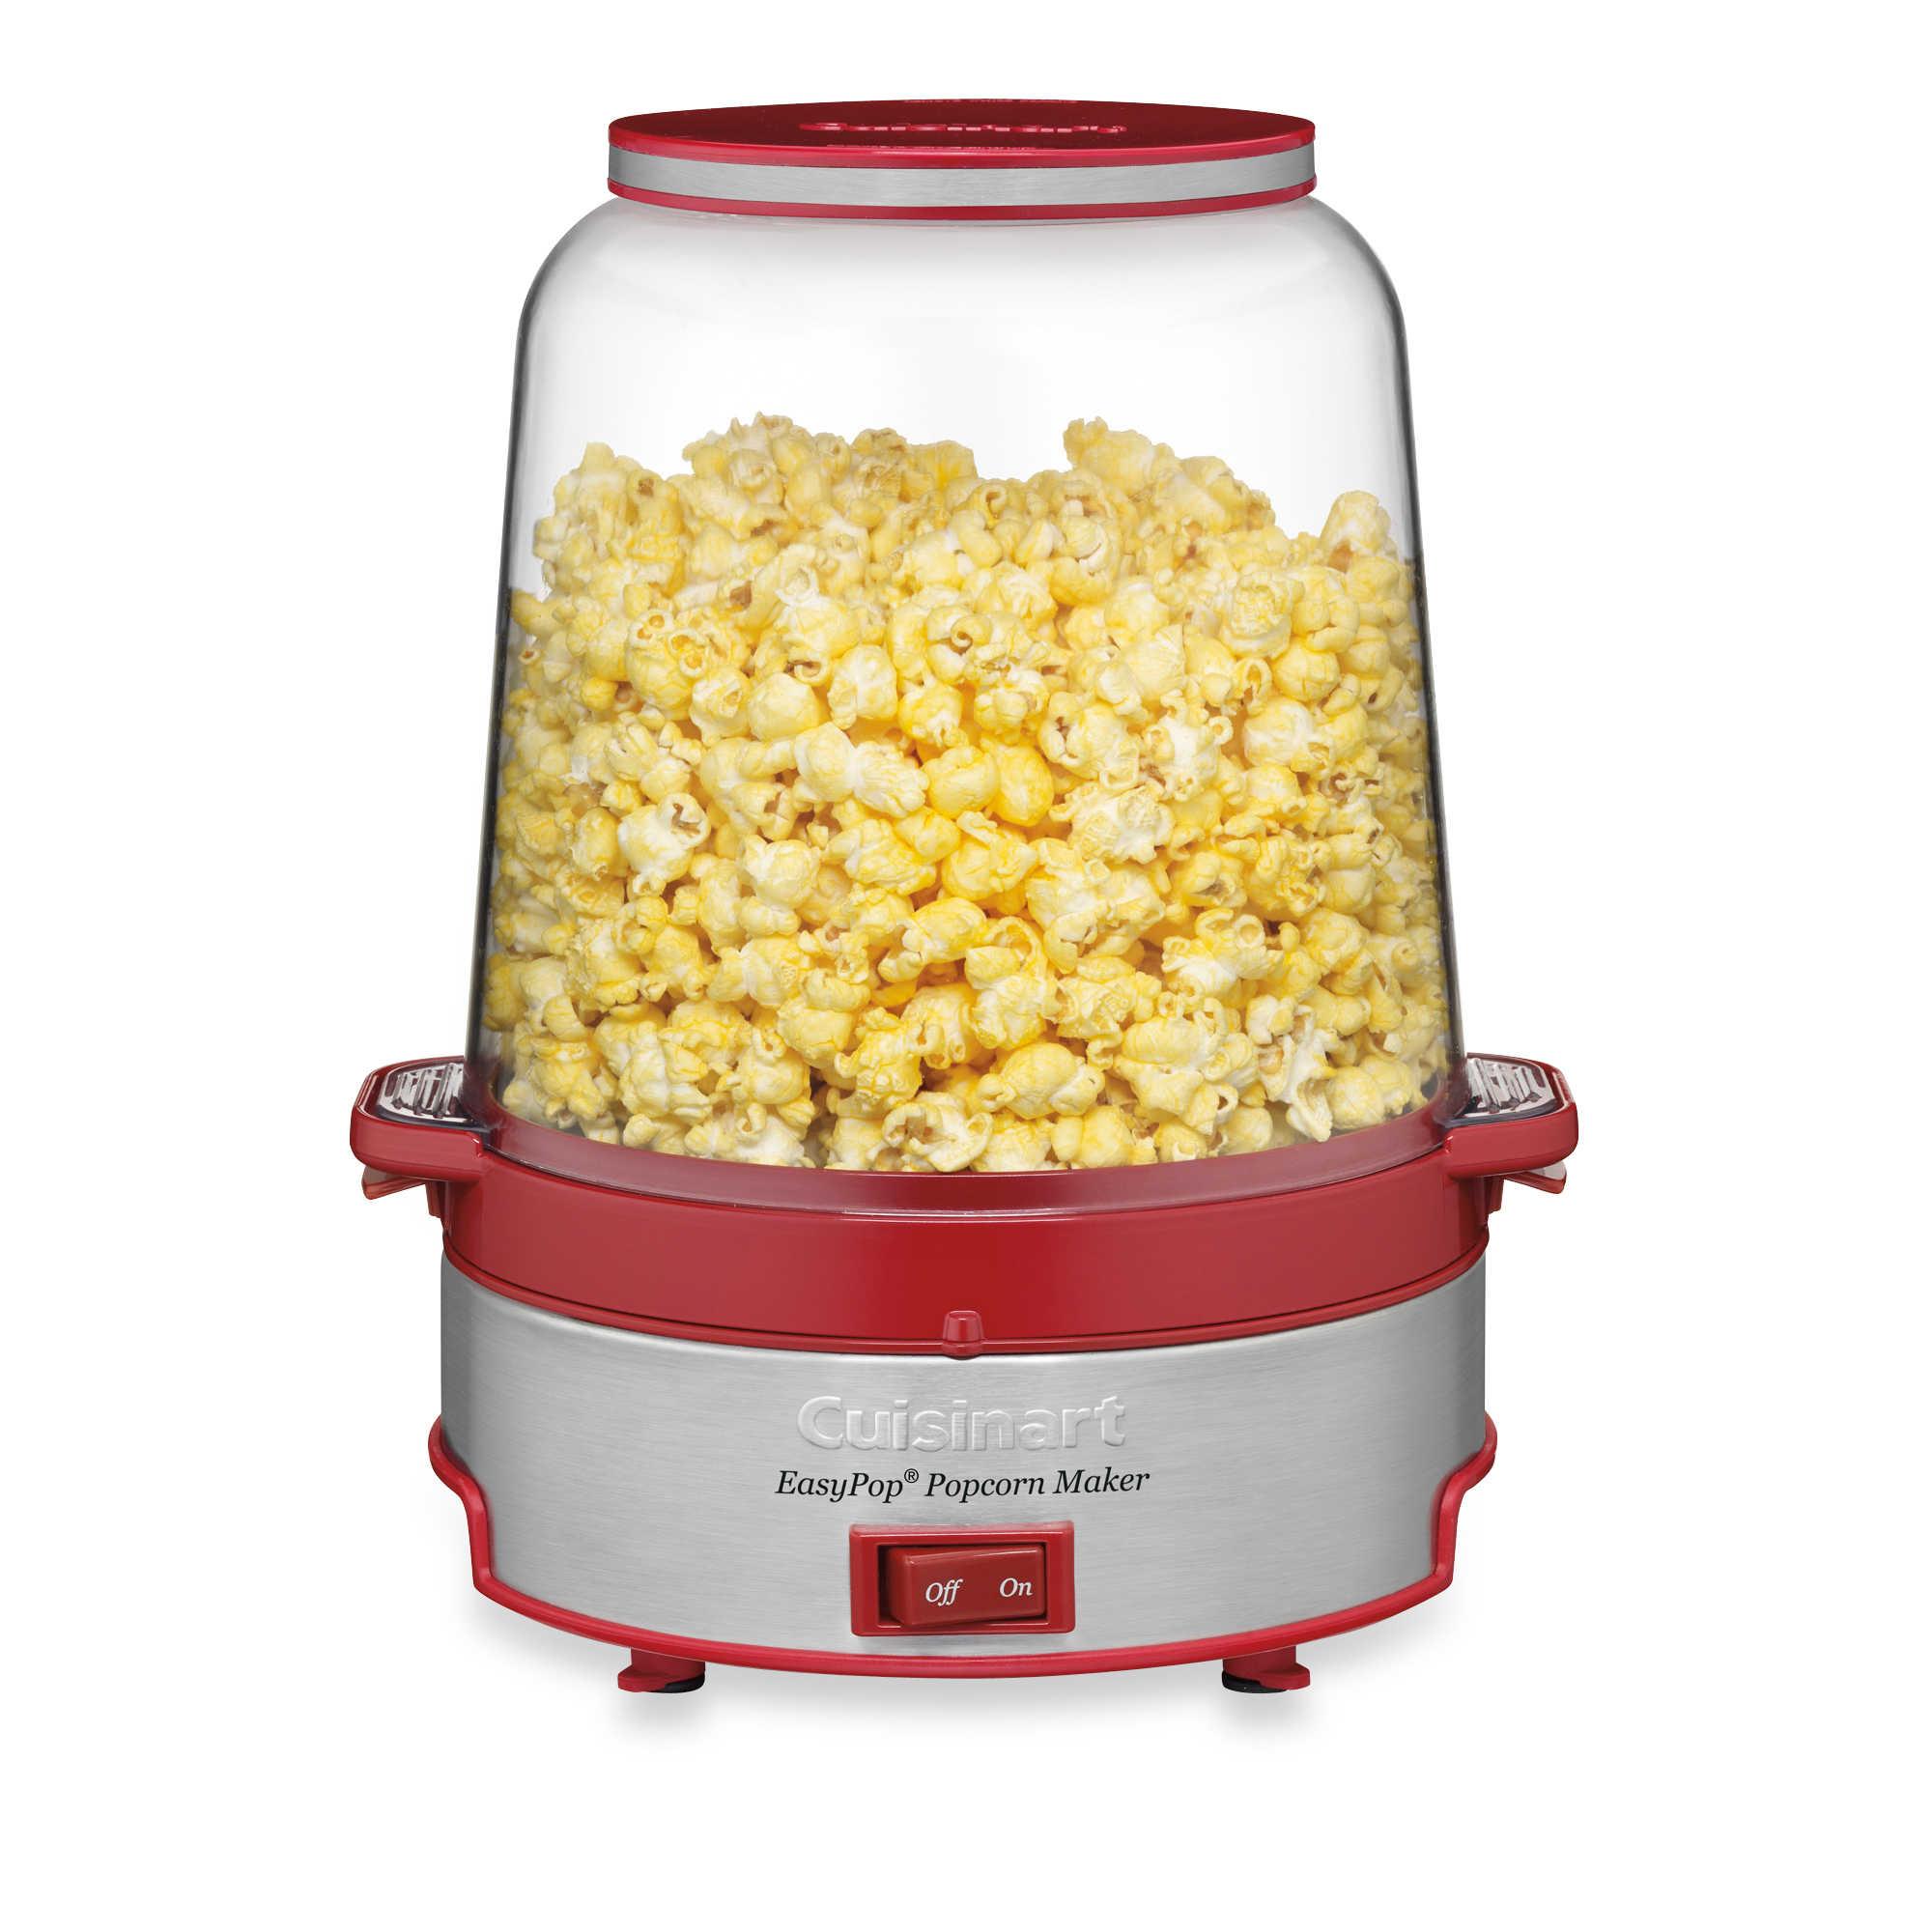 Cuisinart Reg Easypop Popcorn Maker